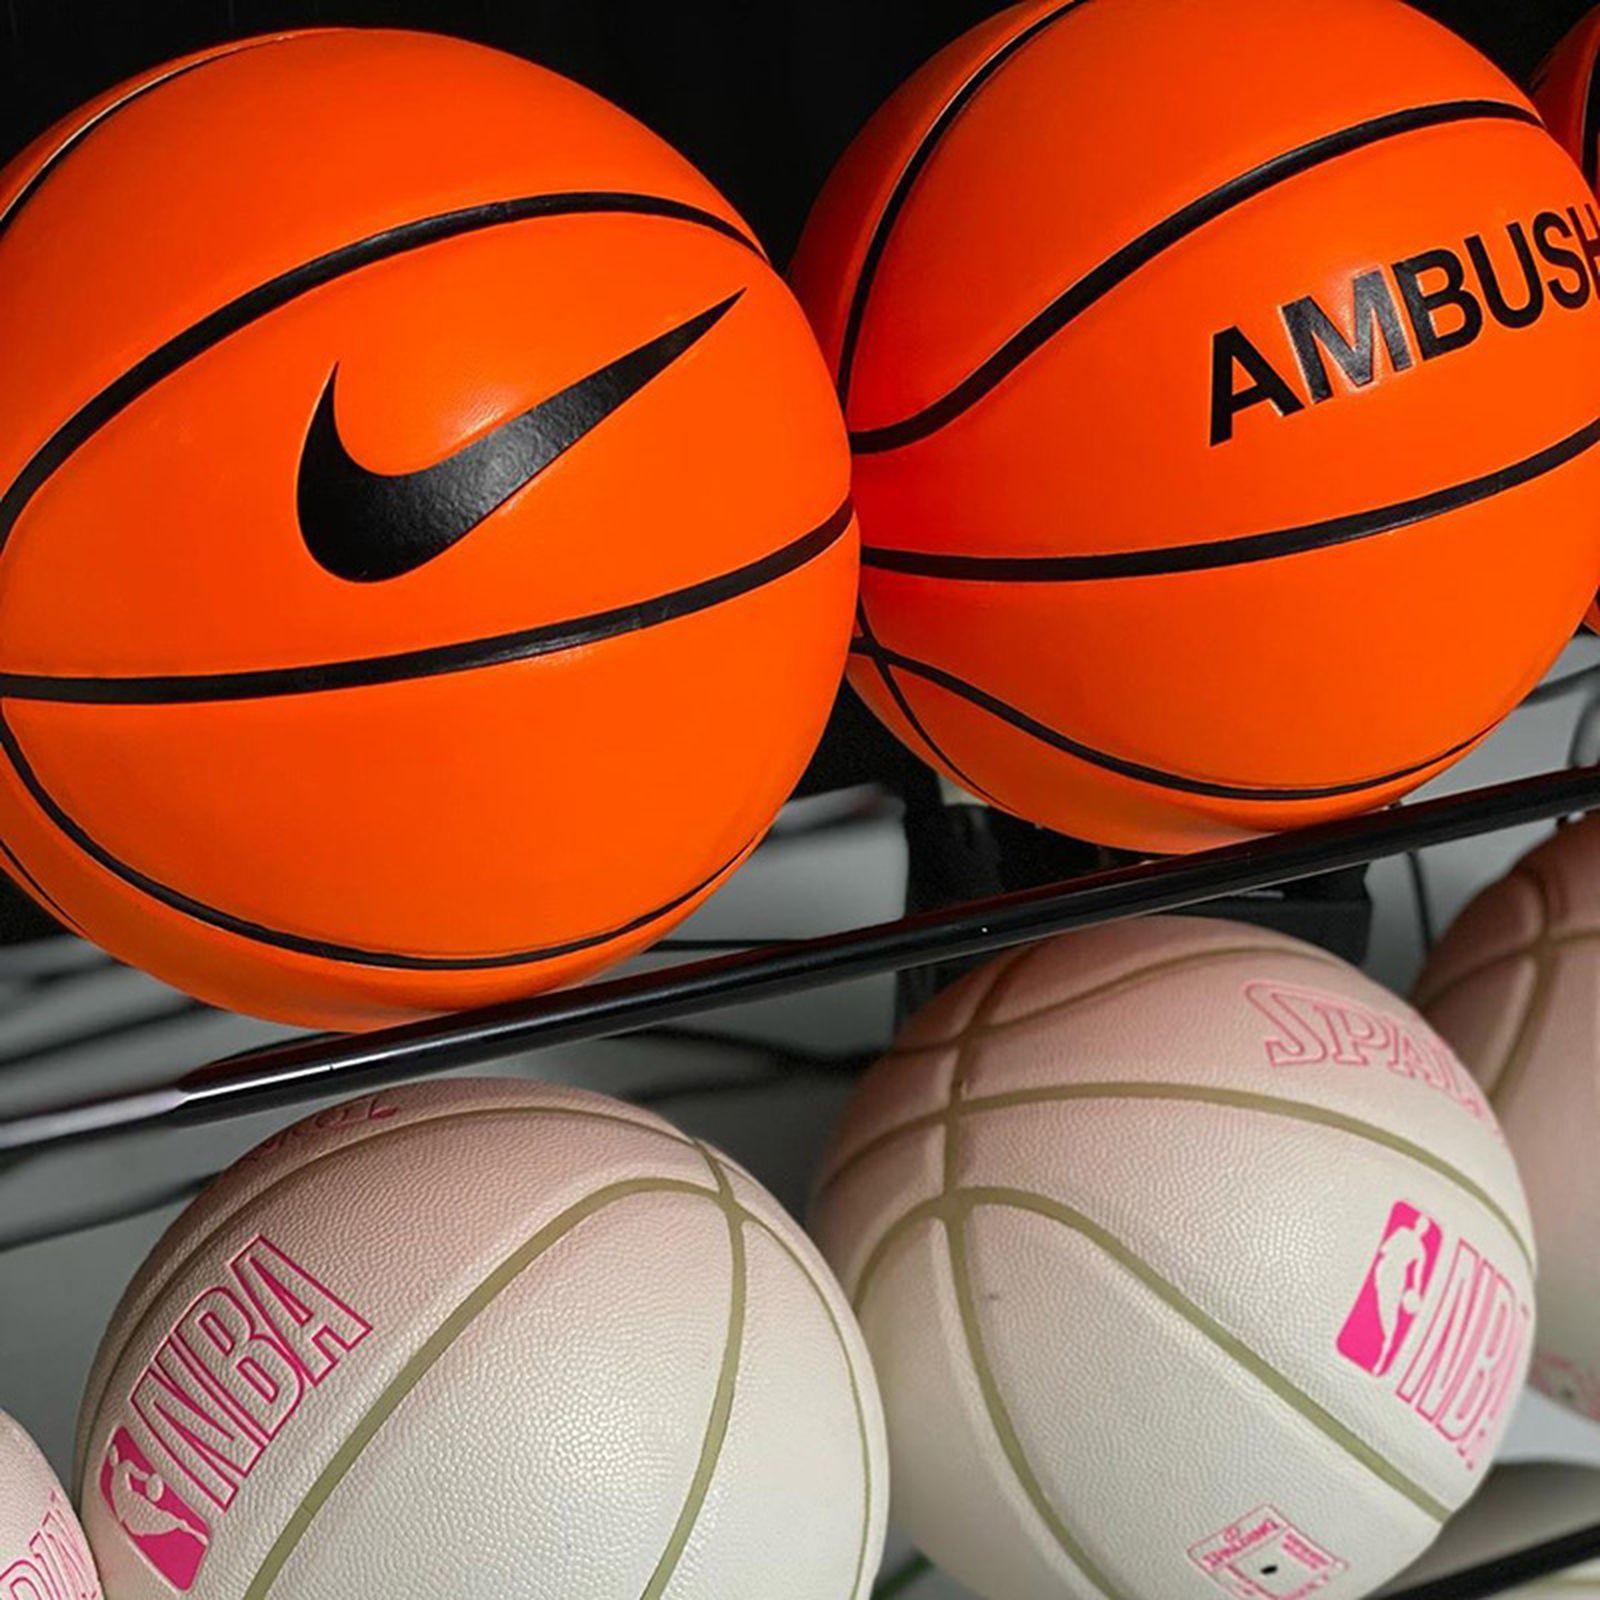 nike-x-nba-x-ambush-basketball-collection-01